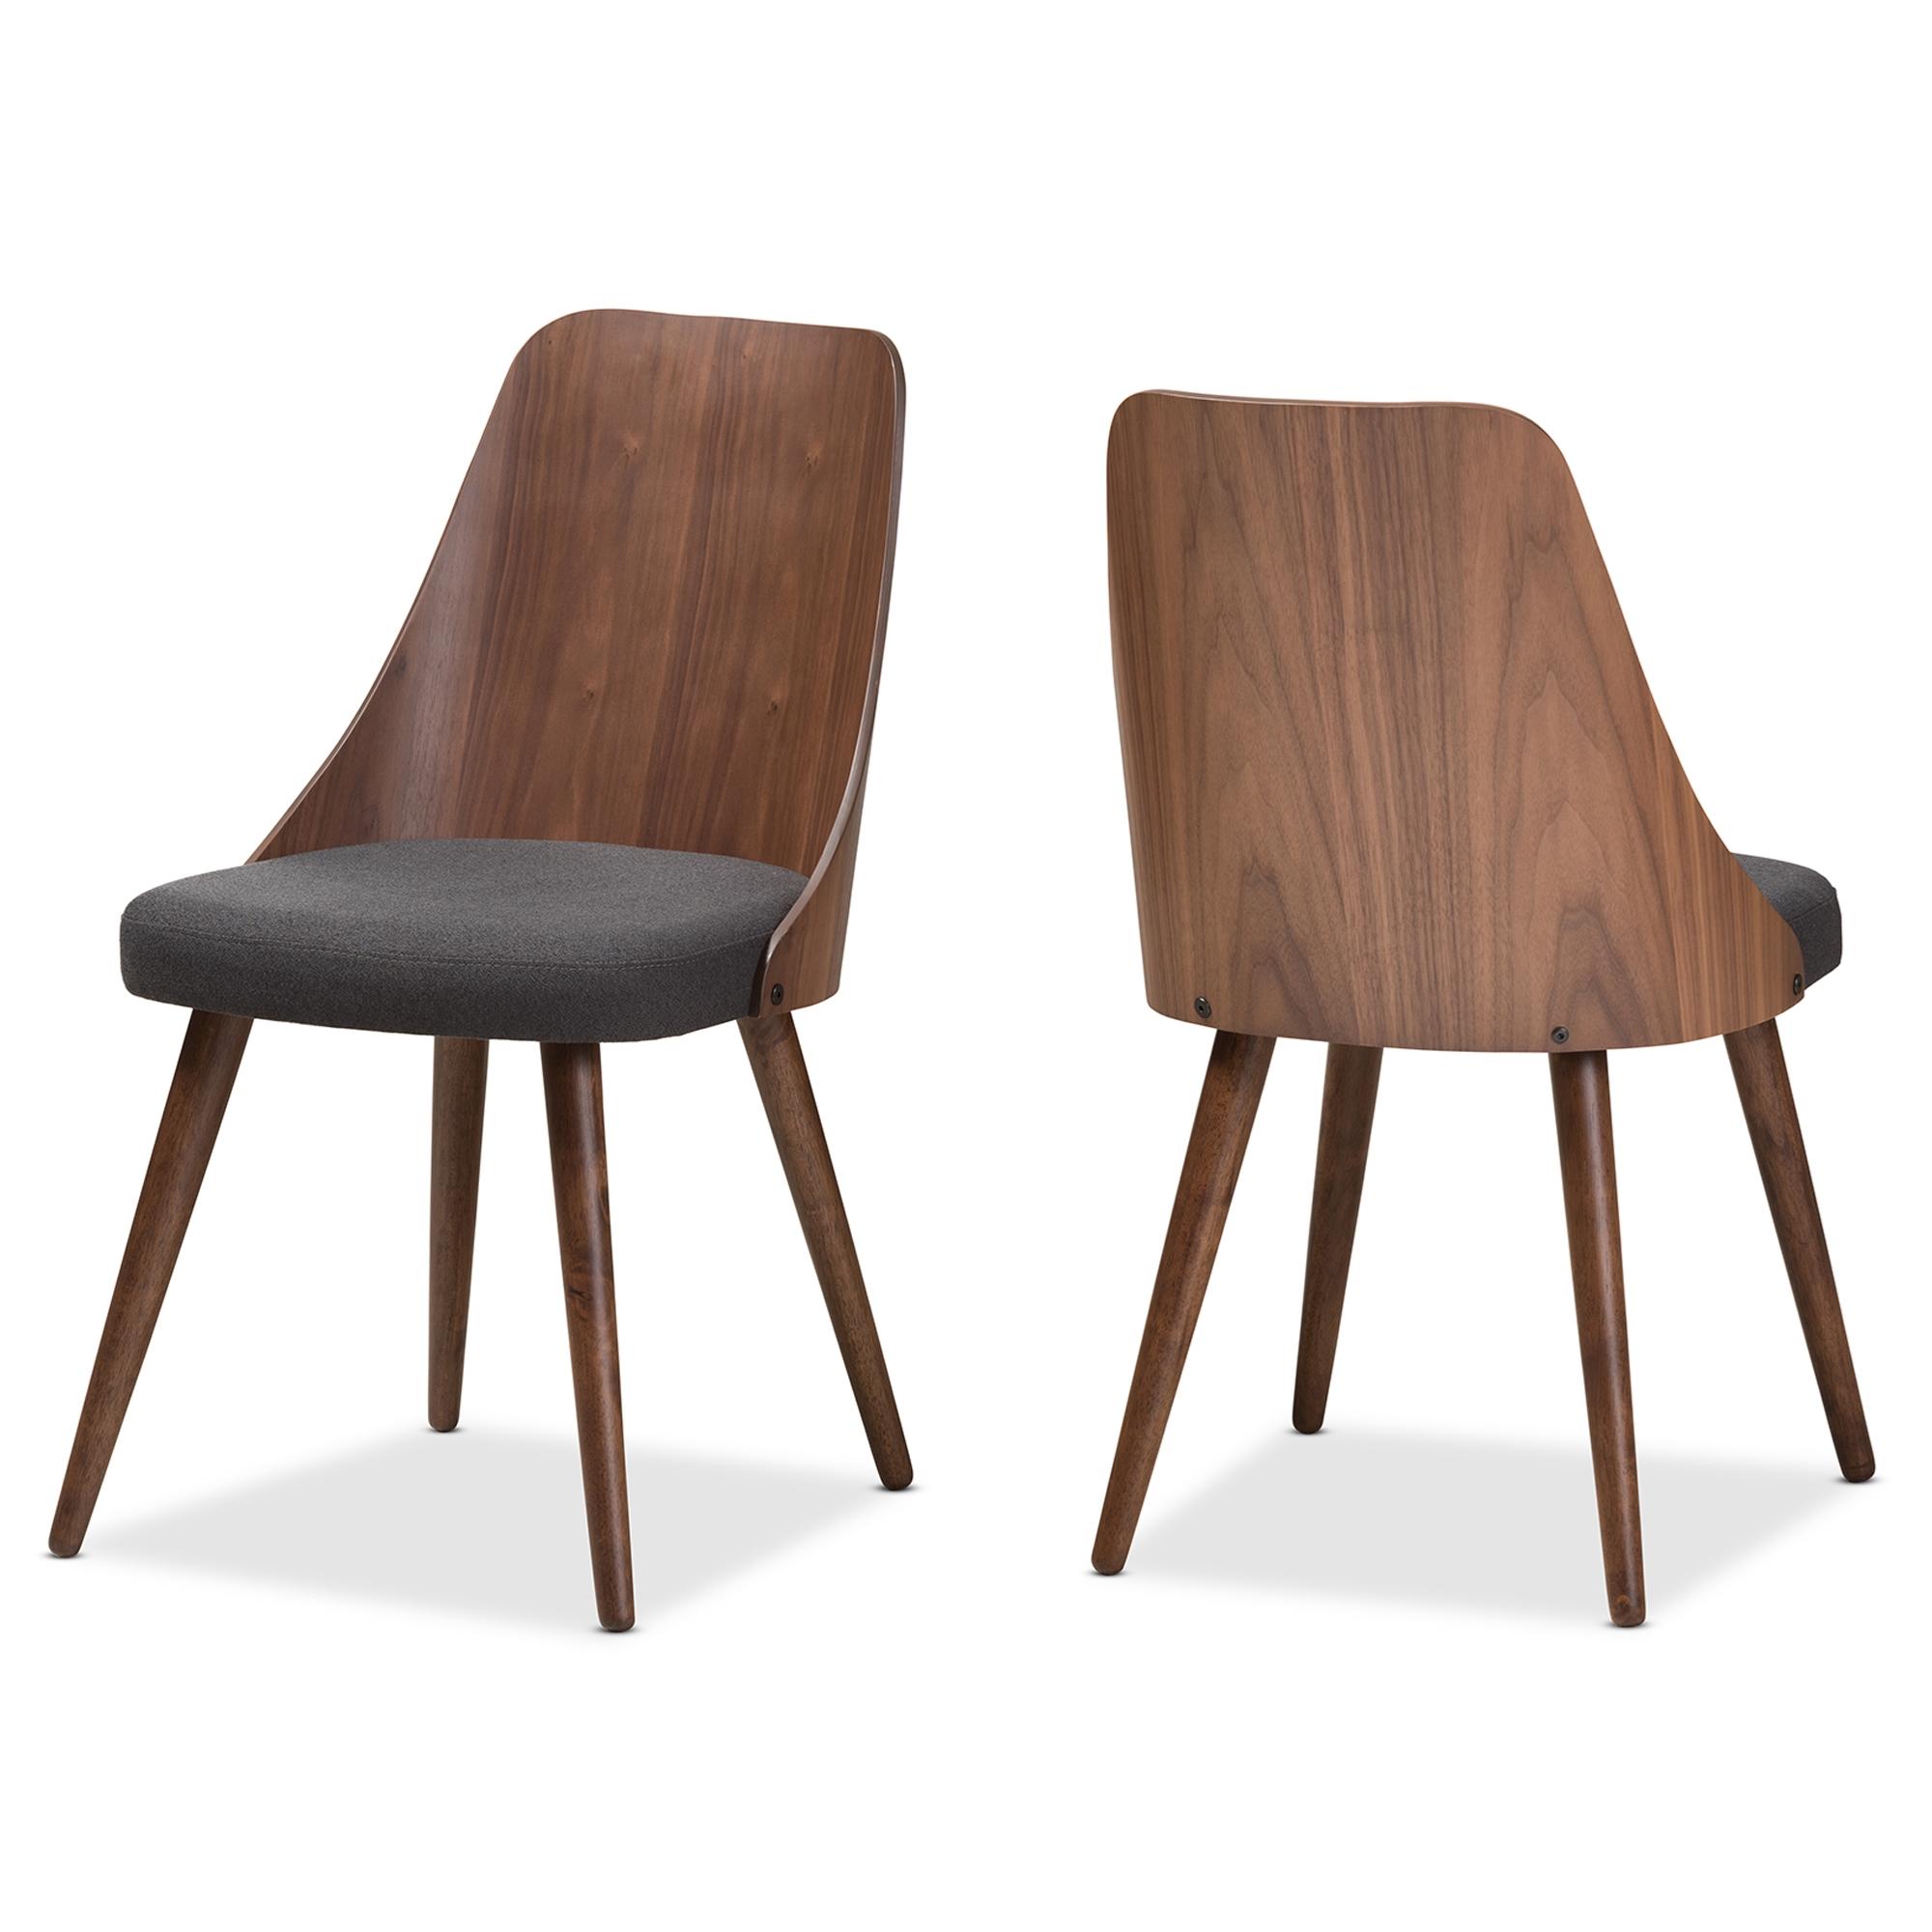 Baxton Studio Romily Mid Century Modern Walnut Wood Dark Grey Fabric Dining  Chair Set Of